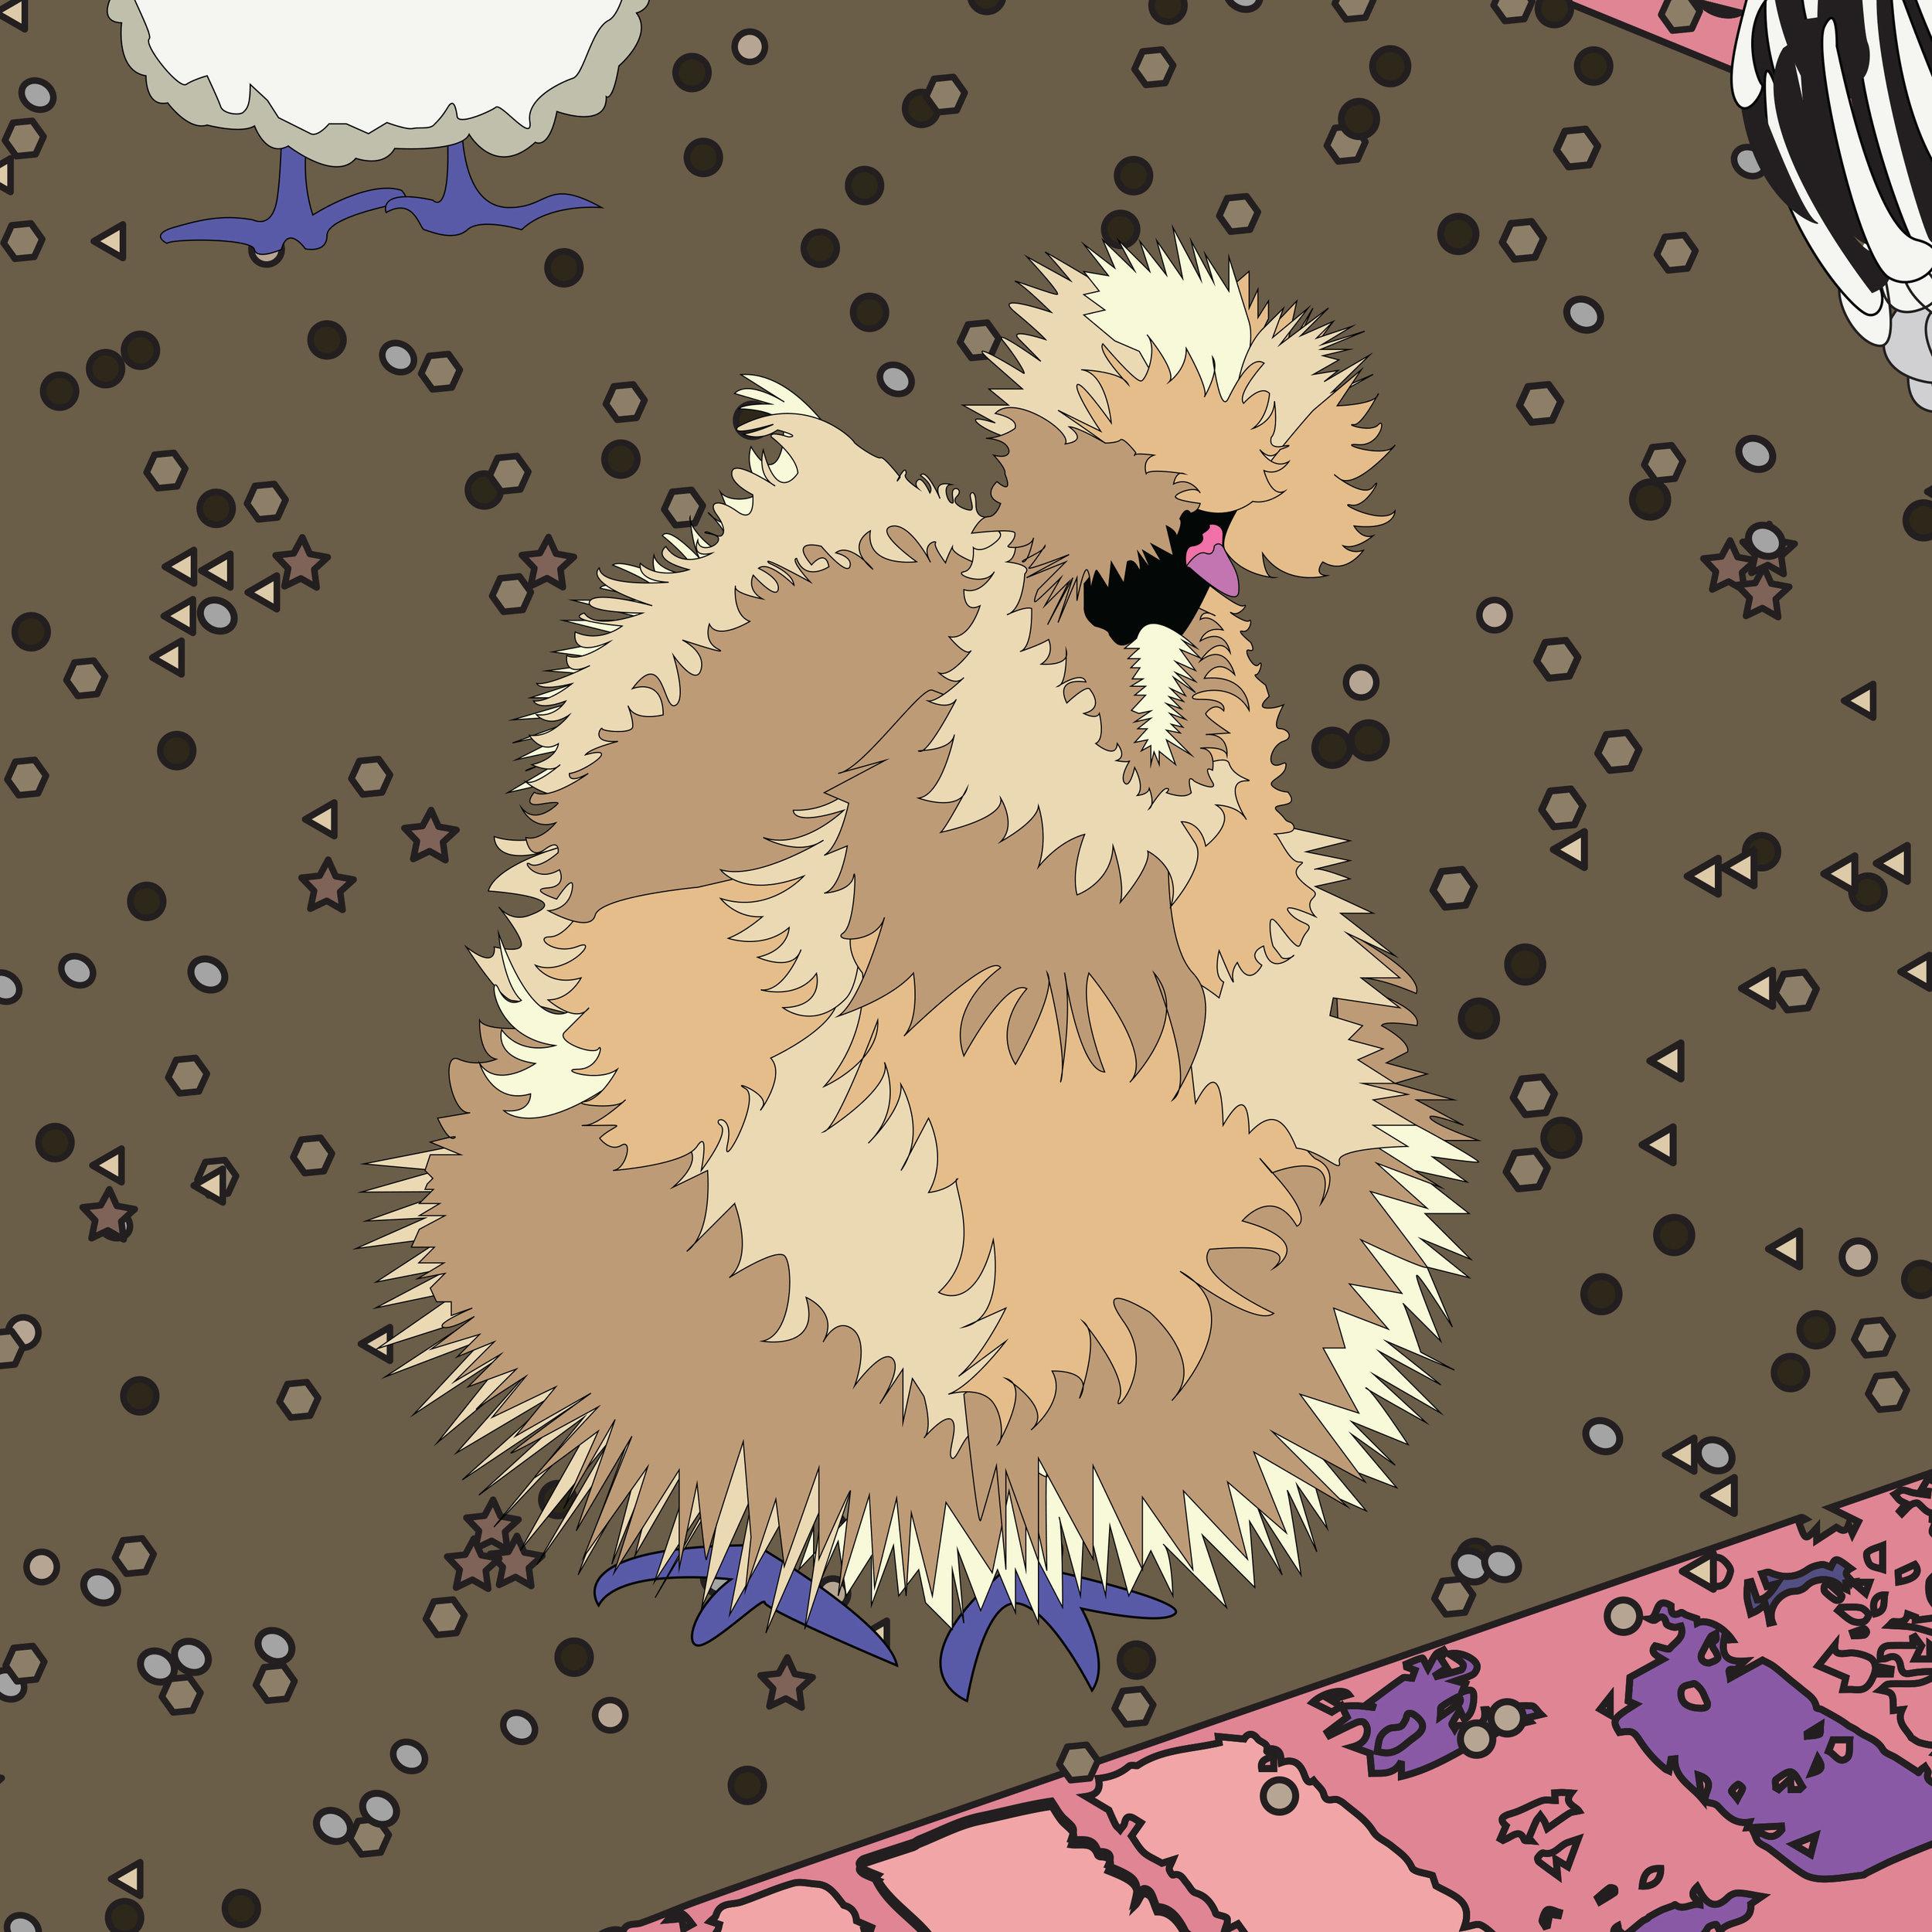 chicken-art-illustration-commission